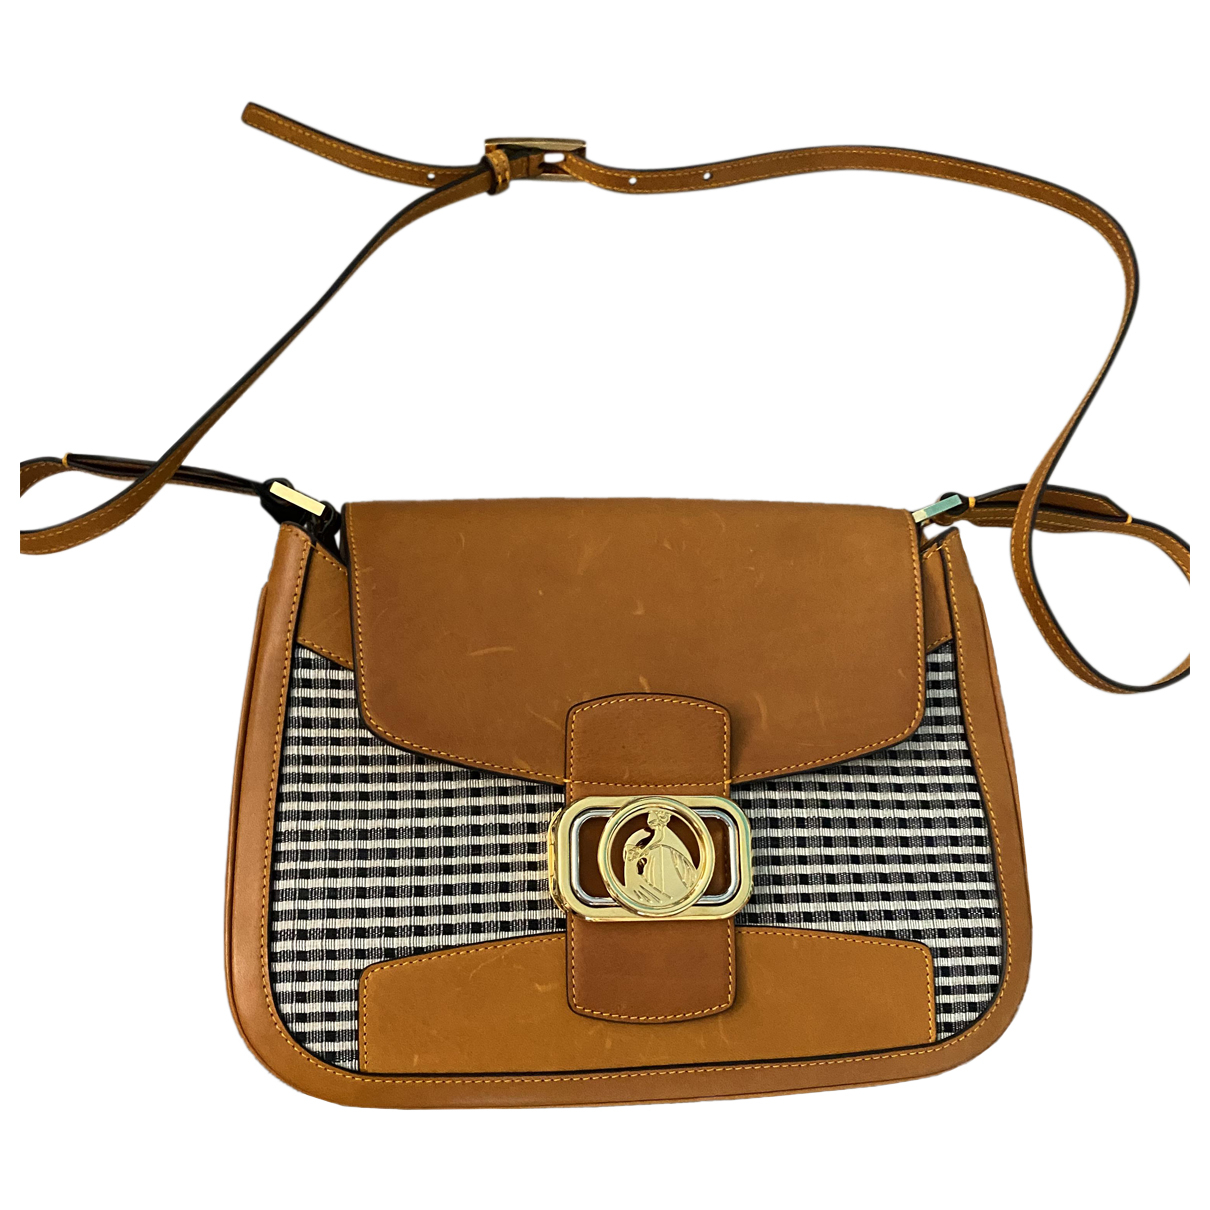 Lanvin N Multicolour Leather handbag for Women N